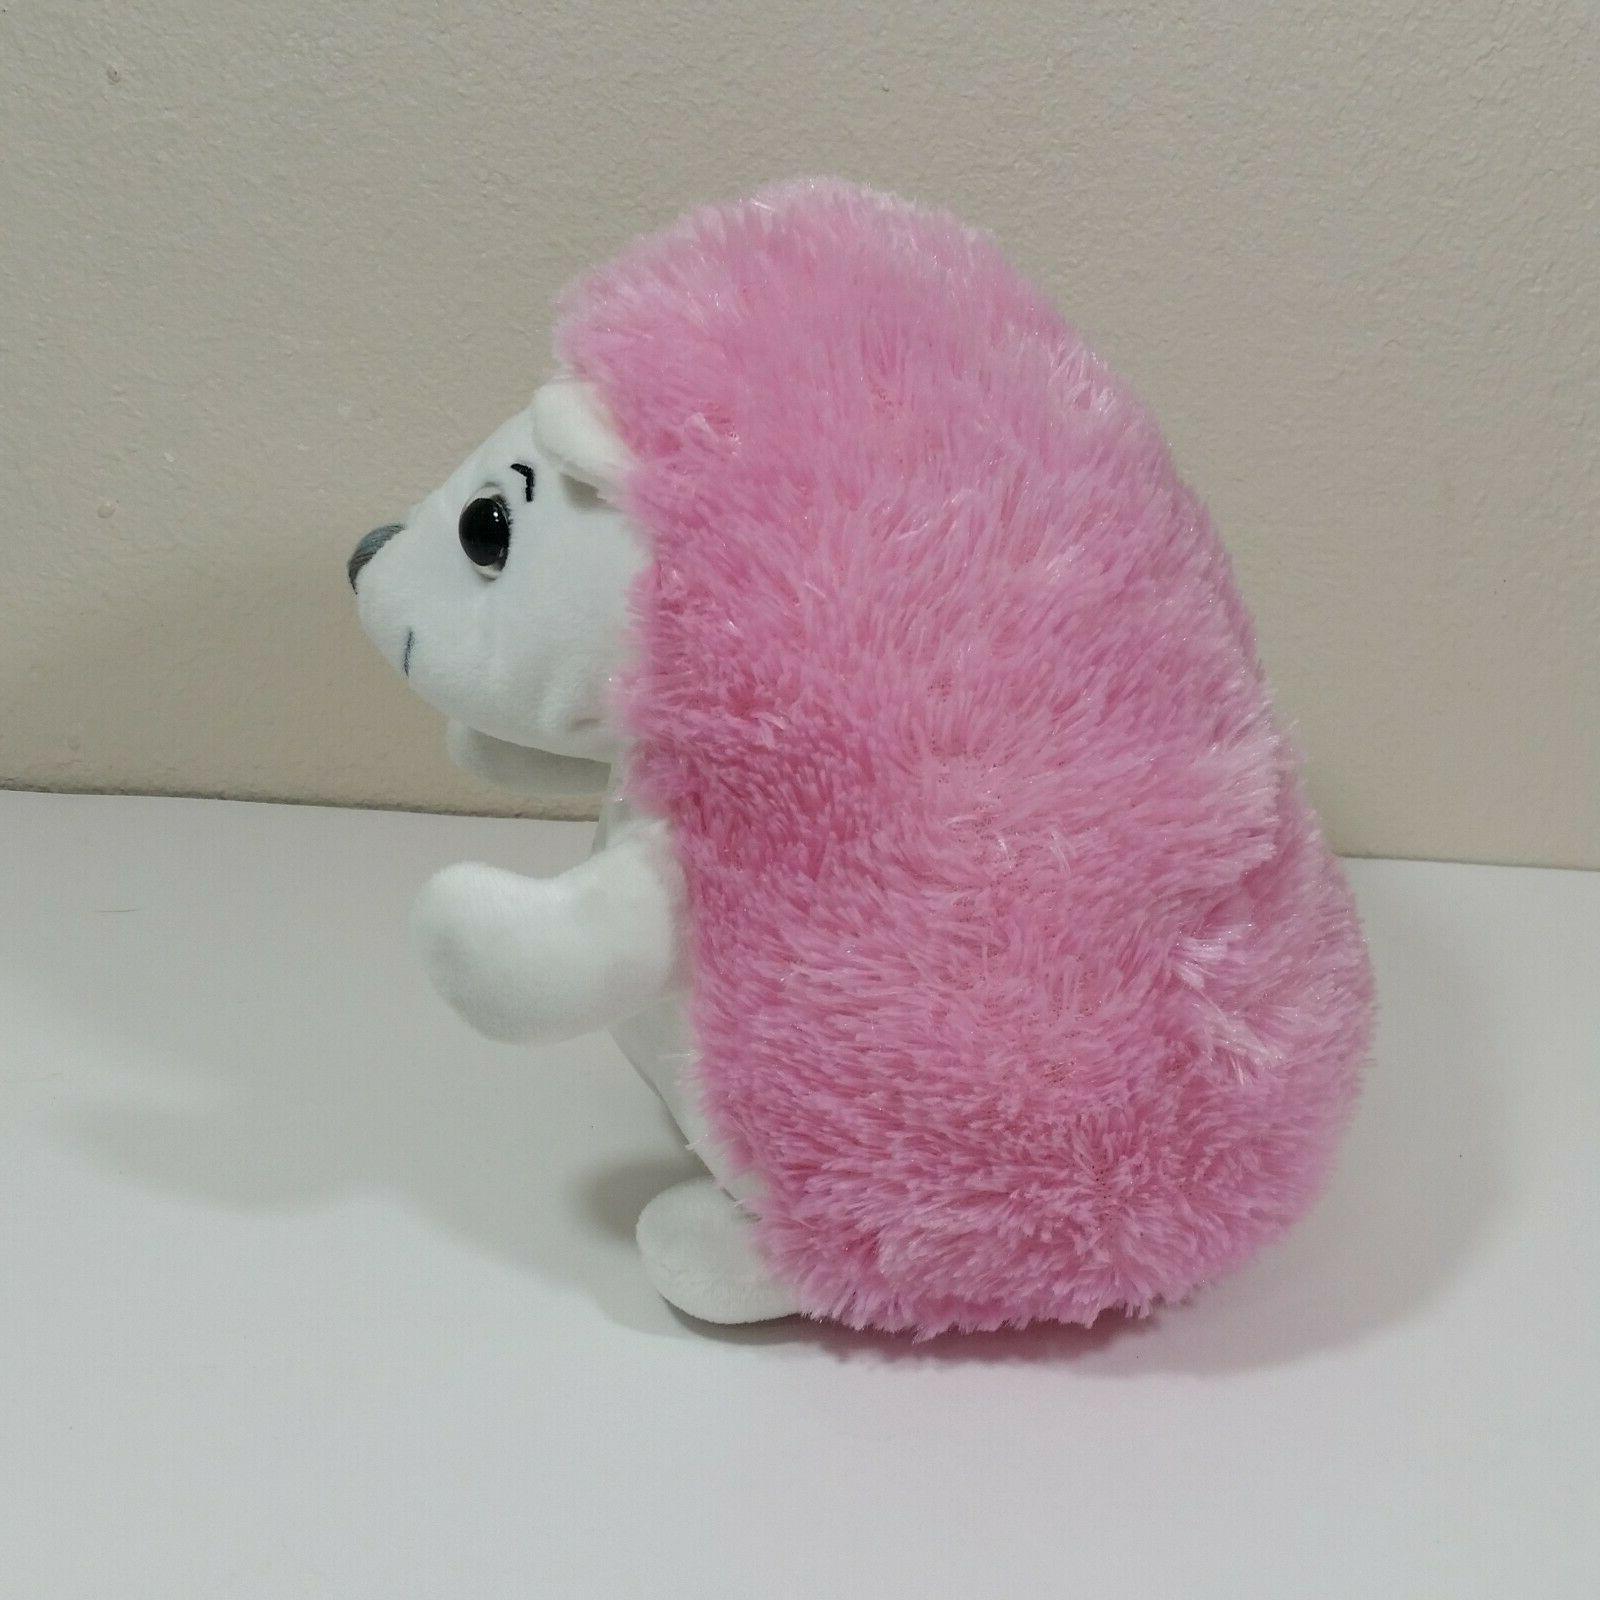 Demdaco Nat & Hedgehog inch Pink White Stuffed Animal Toy